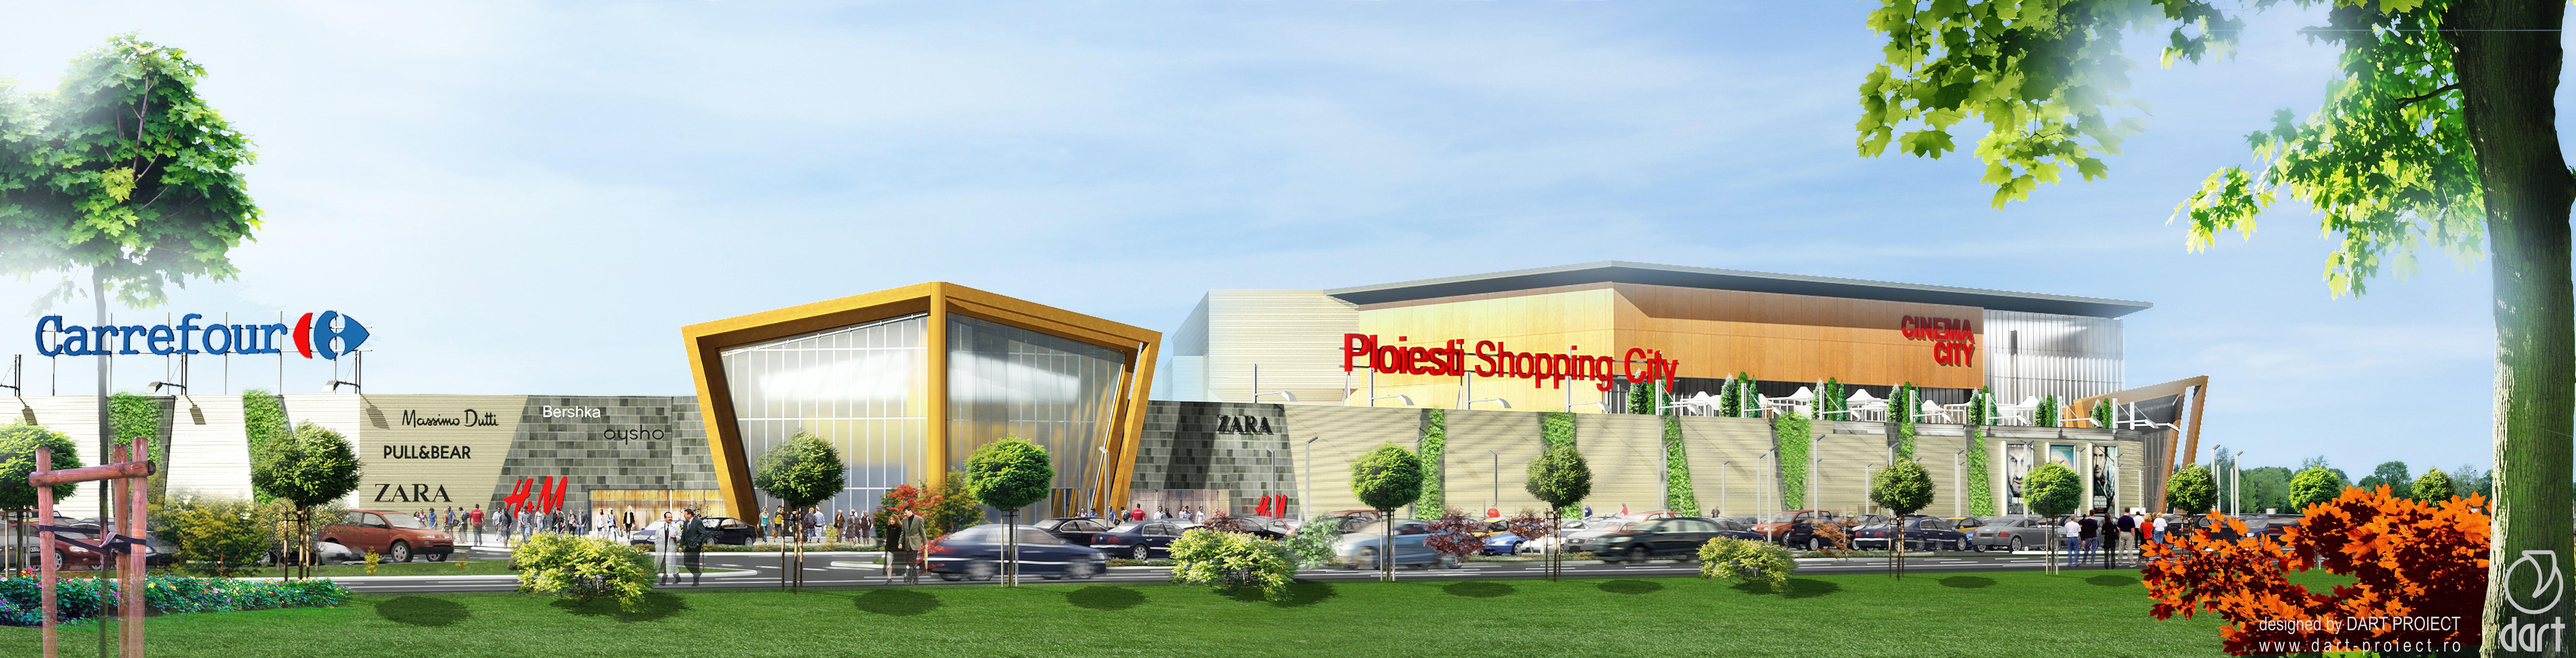 Se deschide un nou mall, langă Carrefour Ploiești